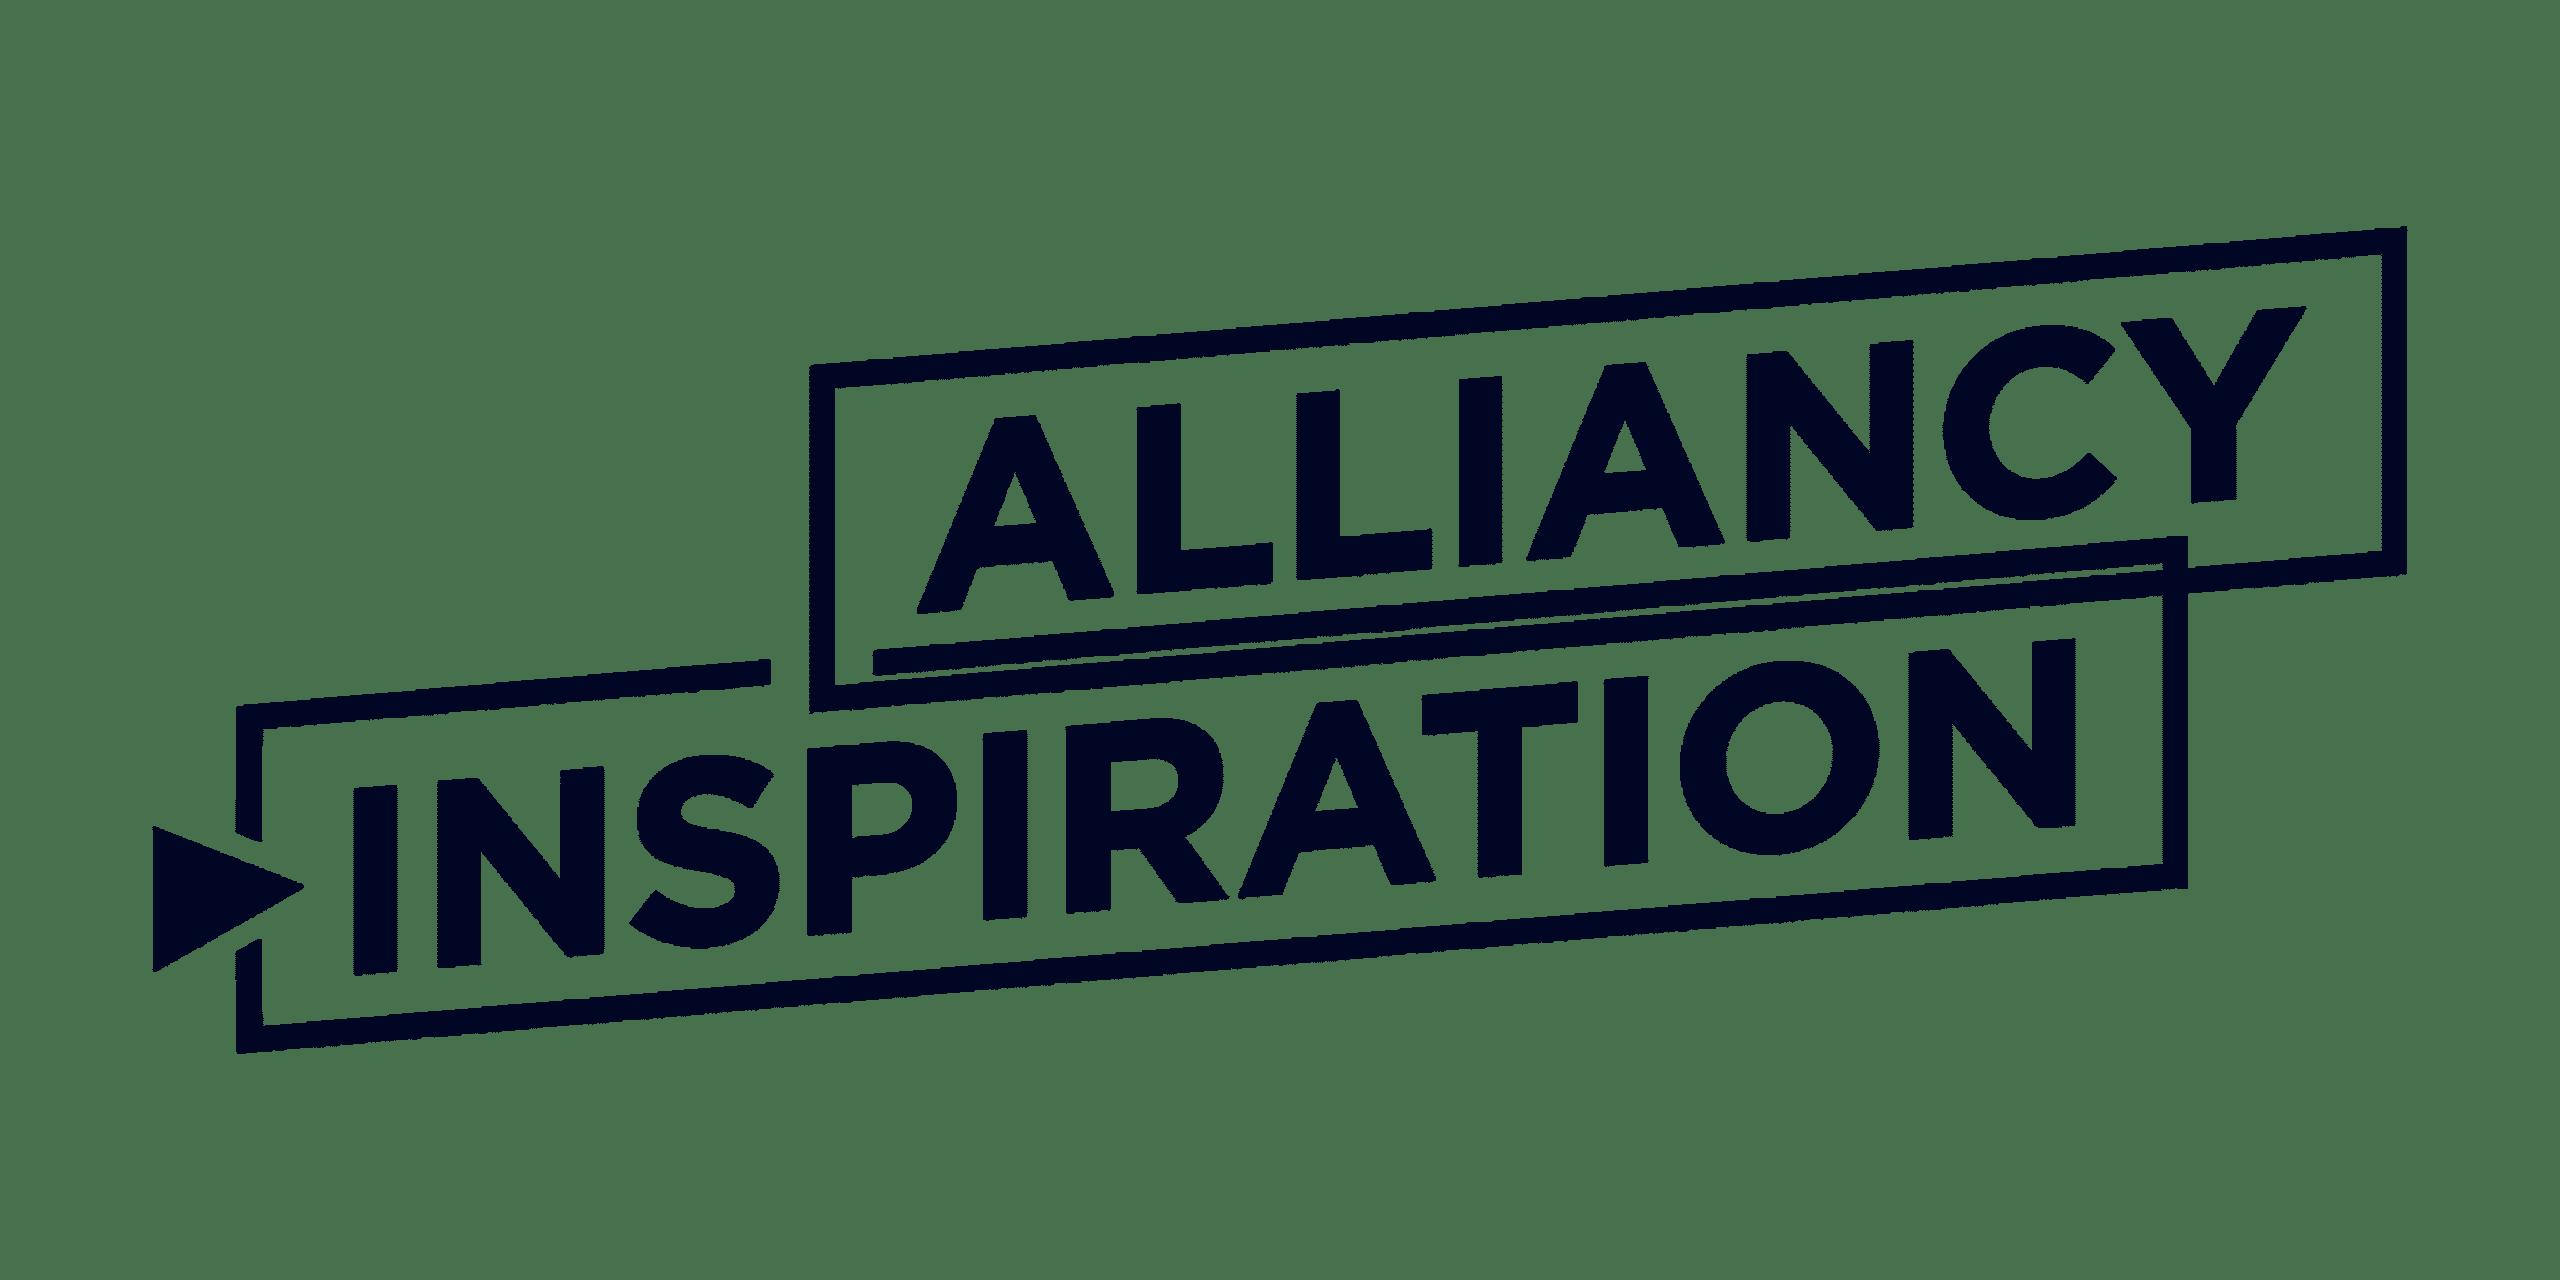 Alliancy Inspiration